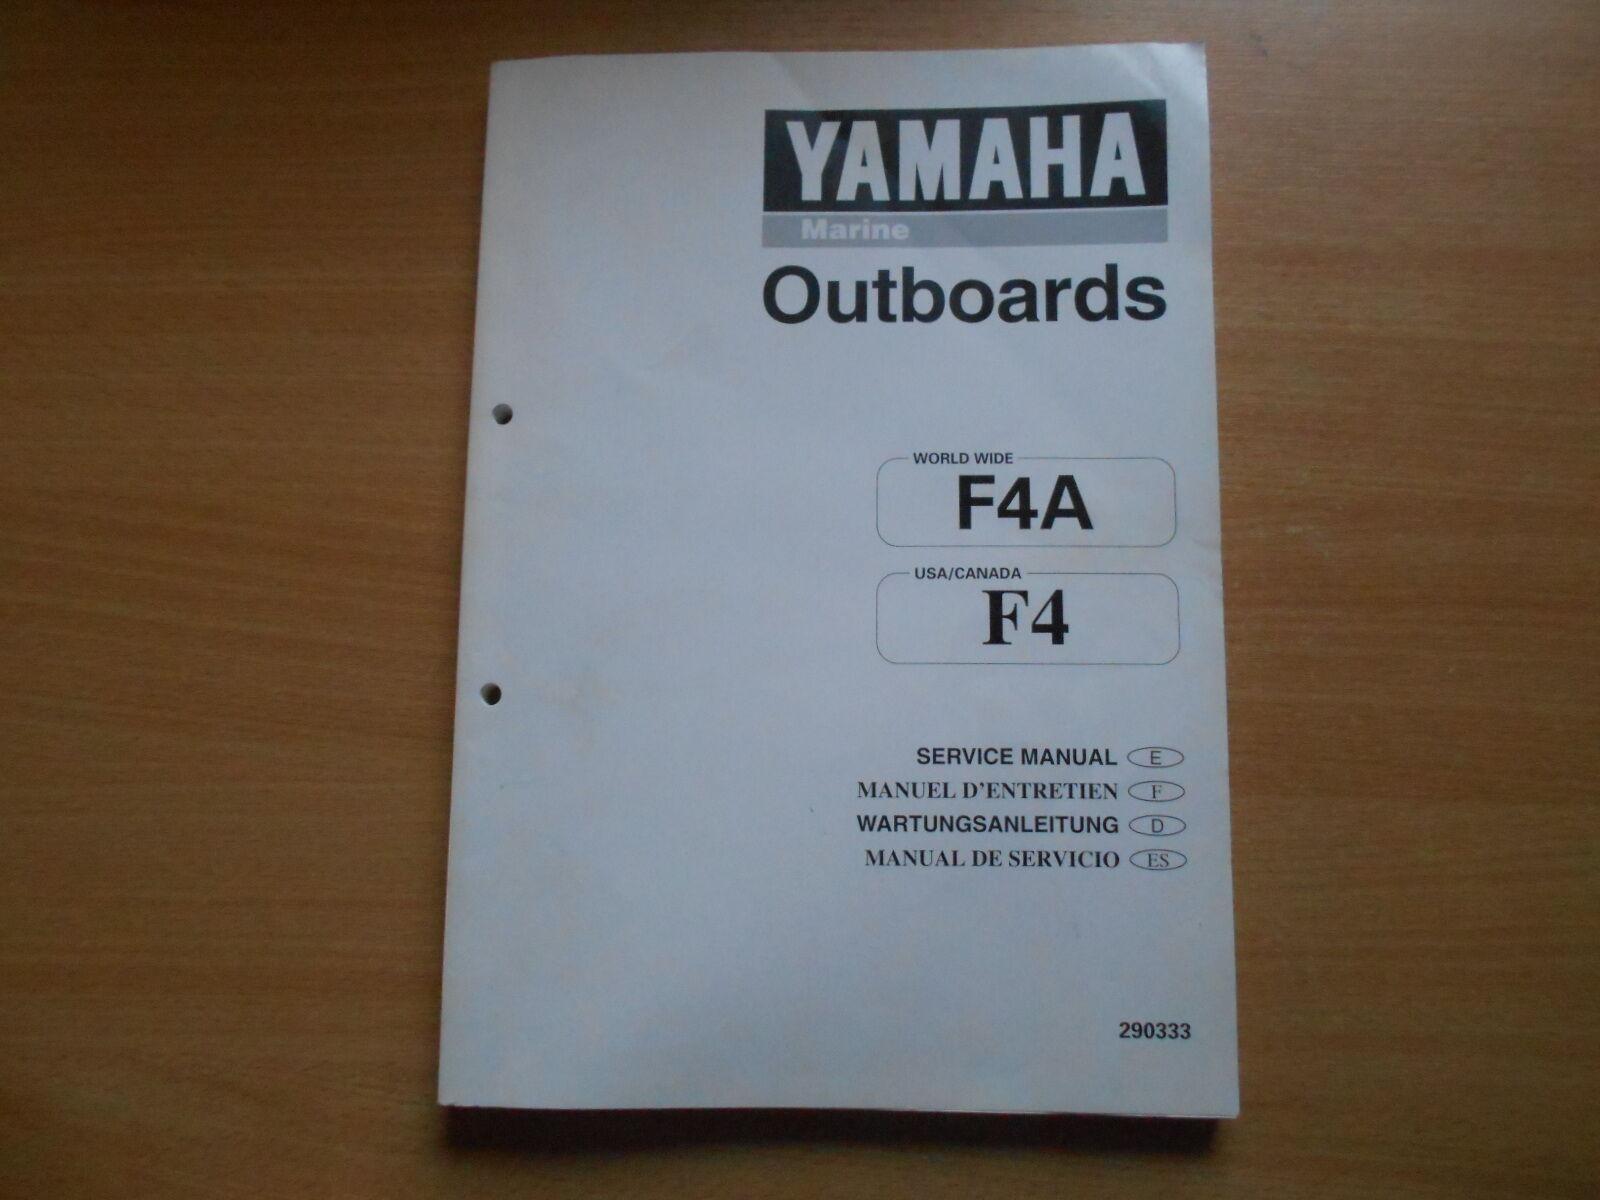 Werkstatthandbuch Werkstatthandbuch Werkstatthandbuch Yamaha Außenborder 4 PS manuel d`entretien service manual ddaaab